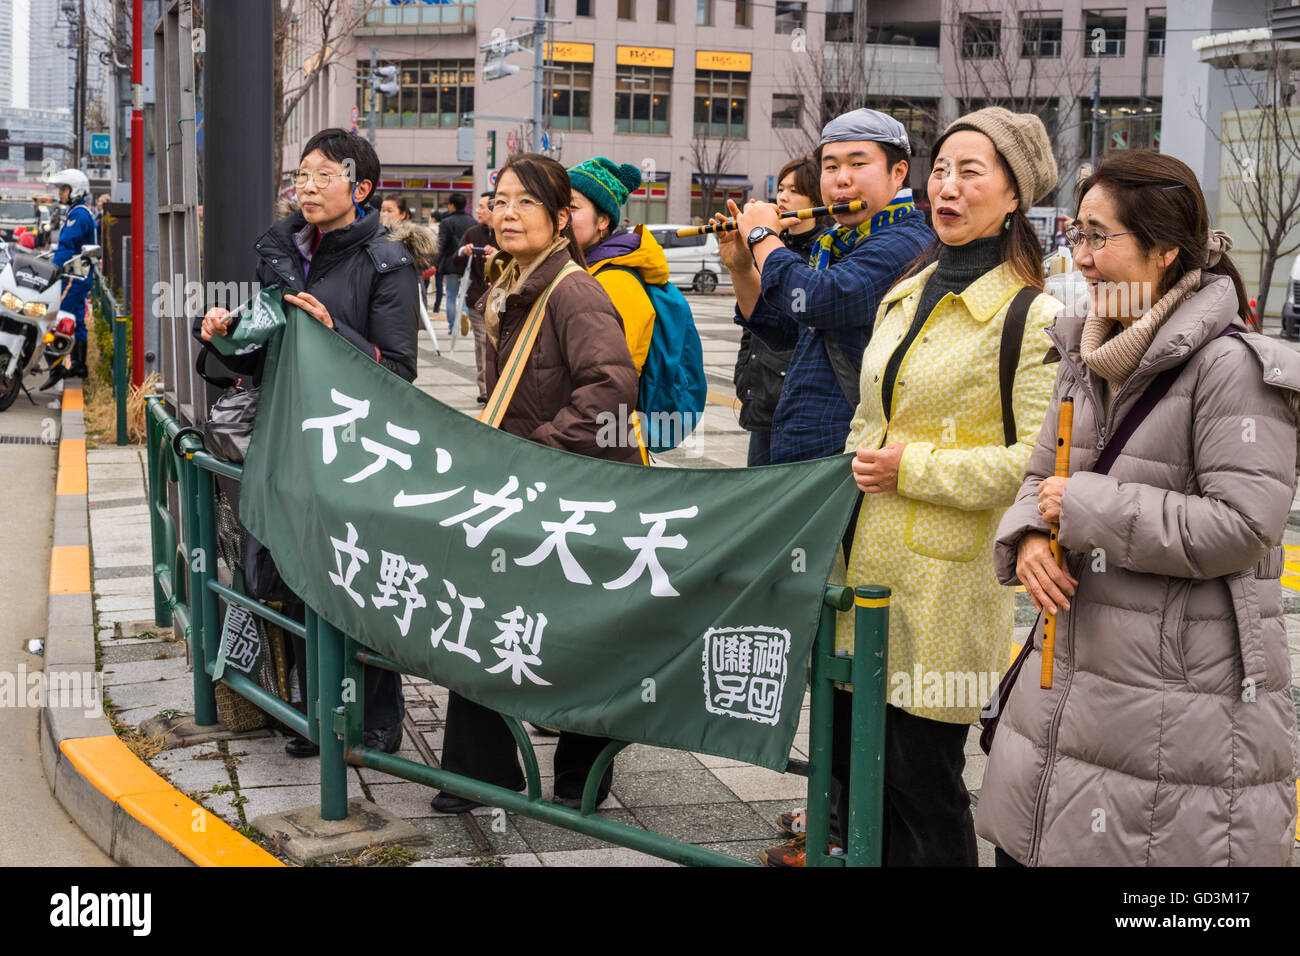 Japanische Bürger jubeln Marathon, Tokyo, japan Stockbild